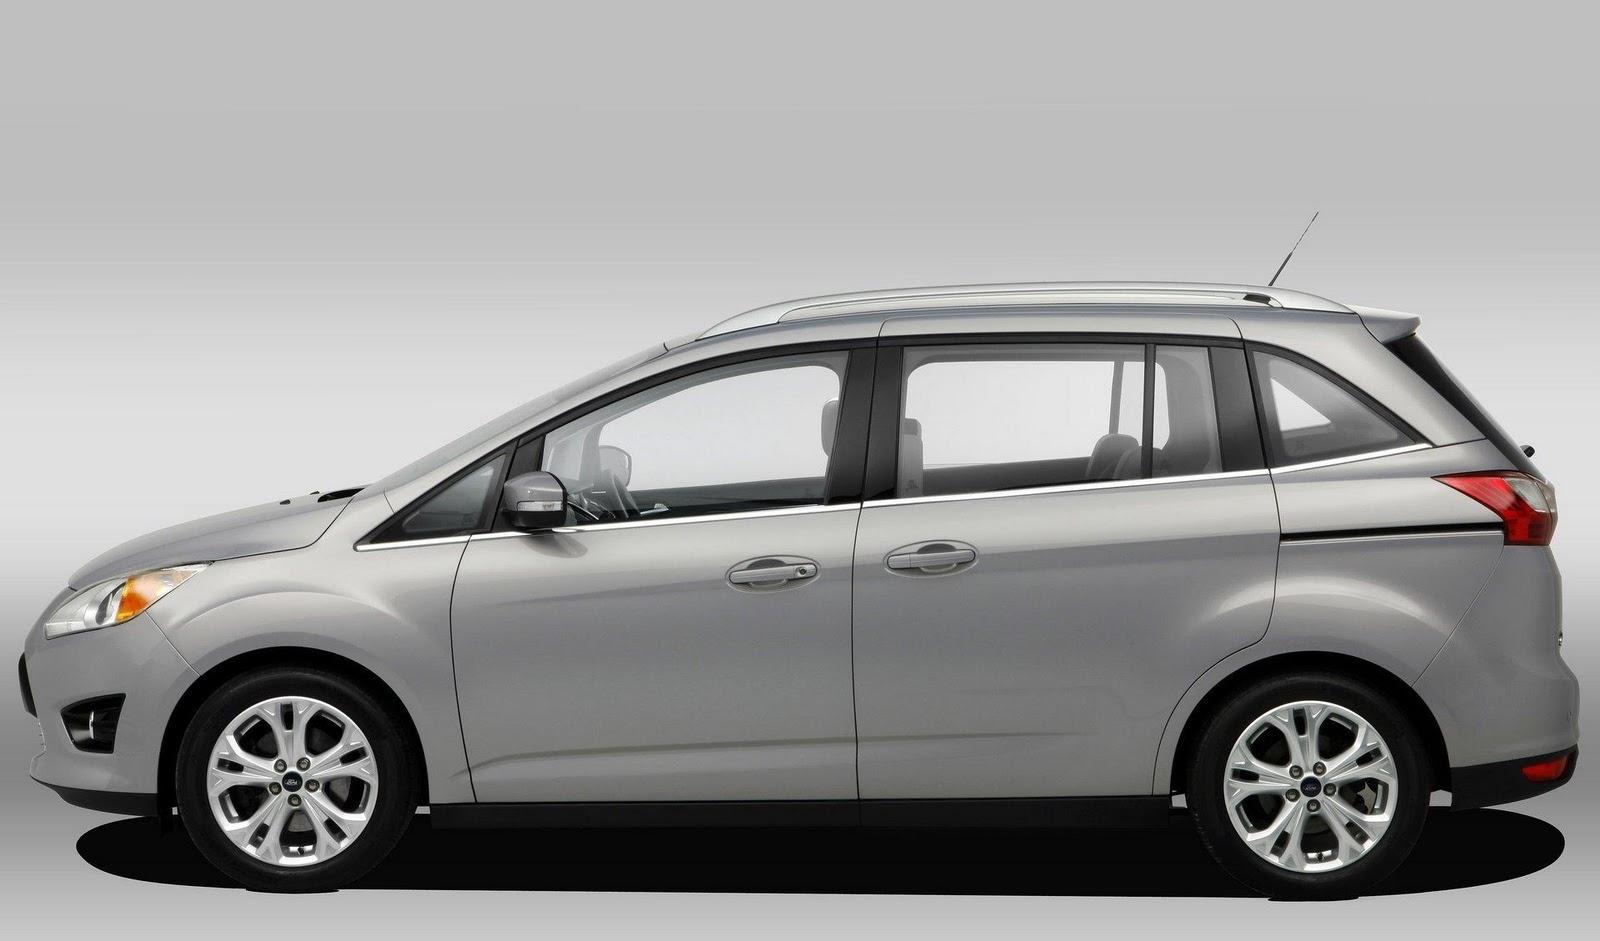 new car image gallery new car 2011 ford c max u s. Black Bedroom Furniture Sets. Home Design Ideas